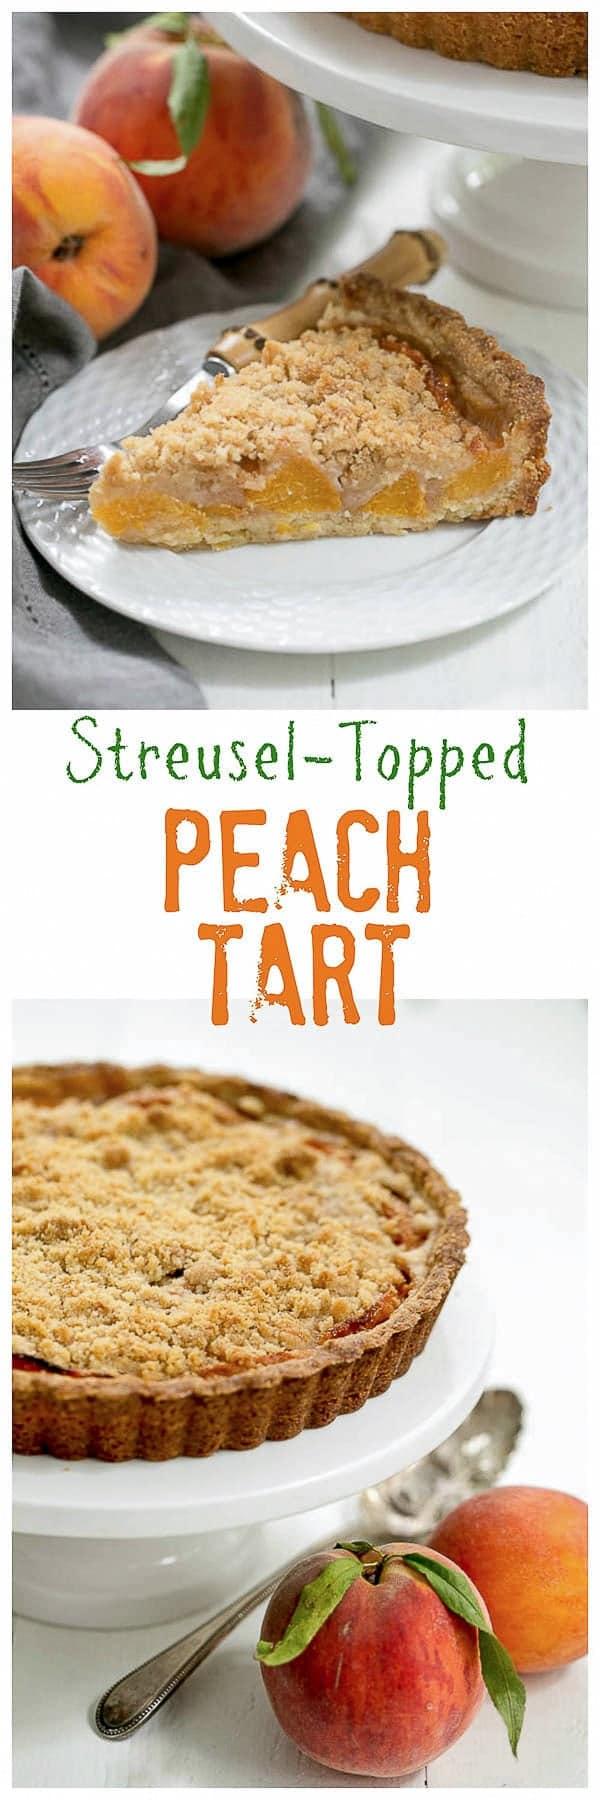 Peach tart pin